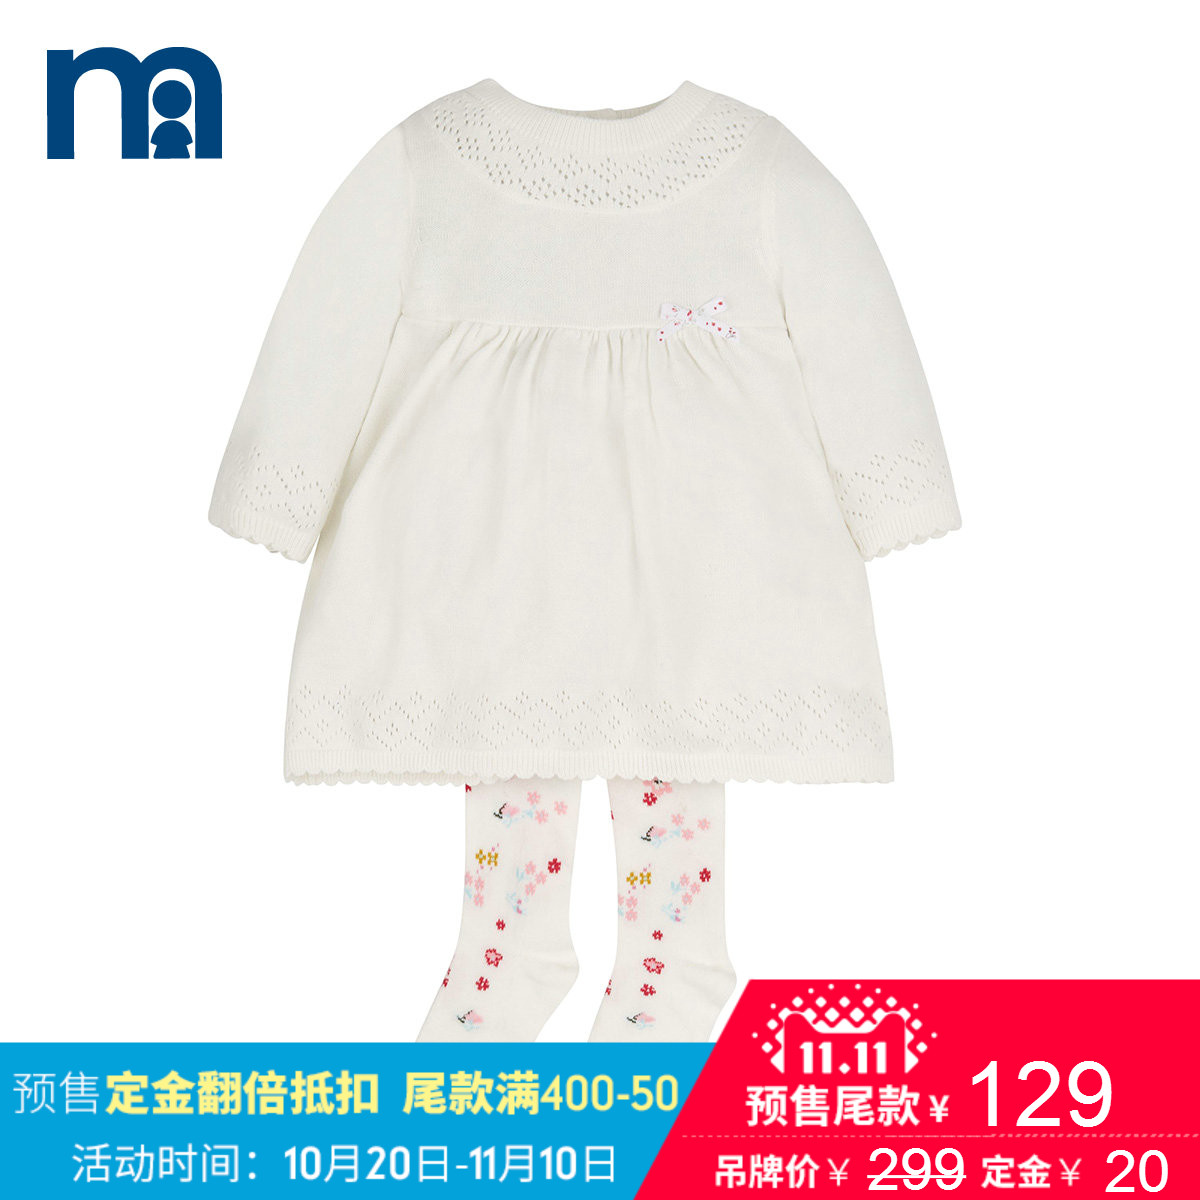 mothercare英国女婴儿连衣裙套装秋新生儿裙子宝宝连裤袜2件套装